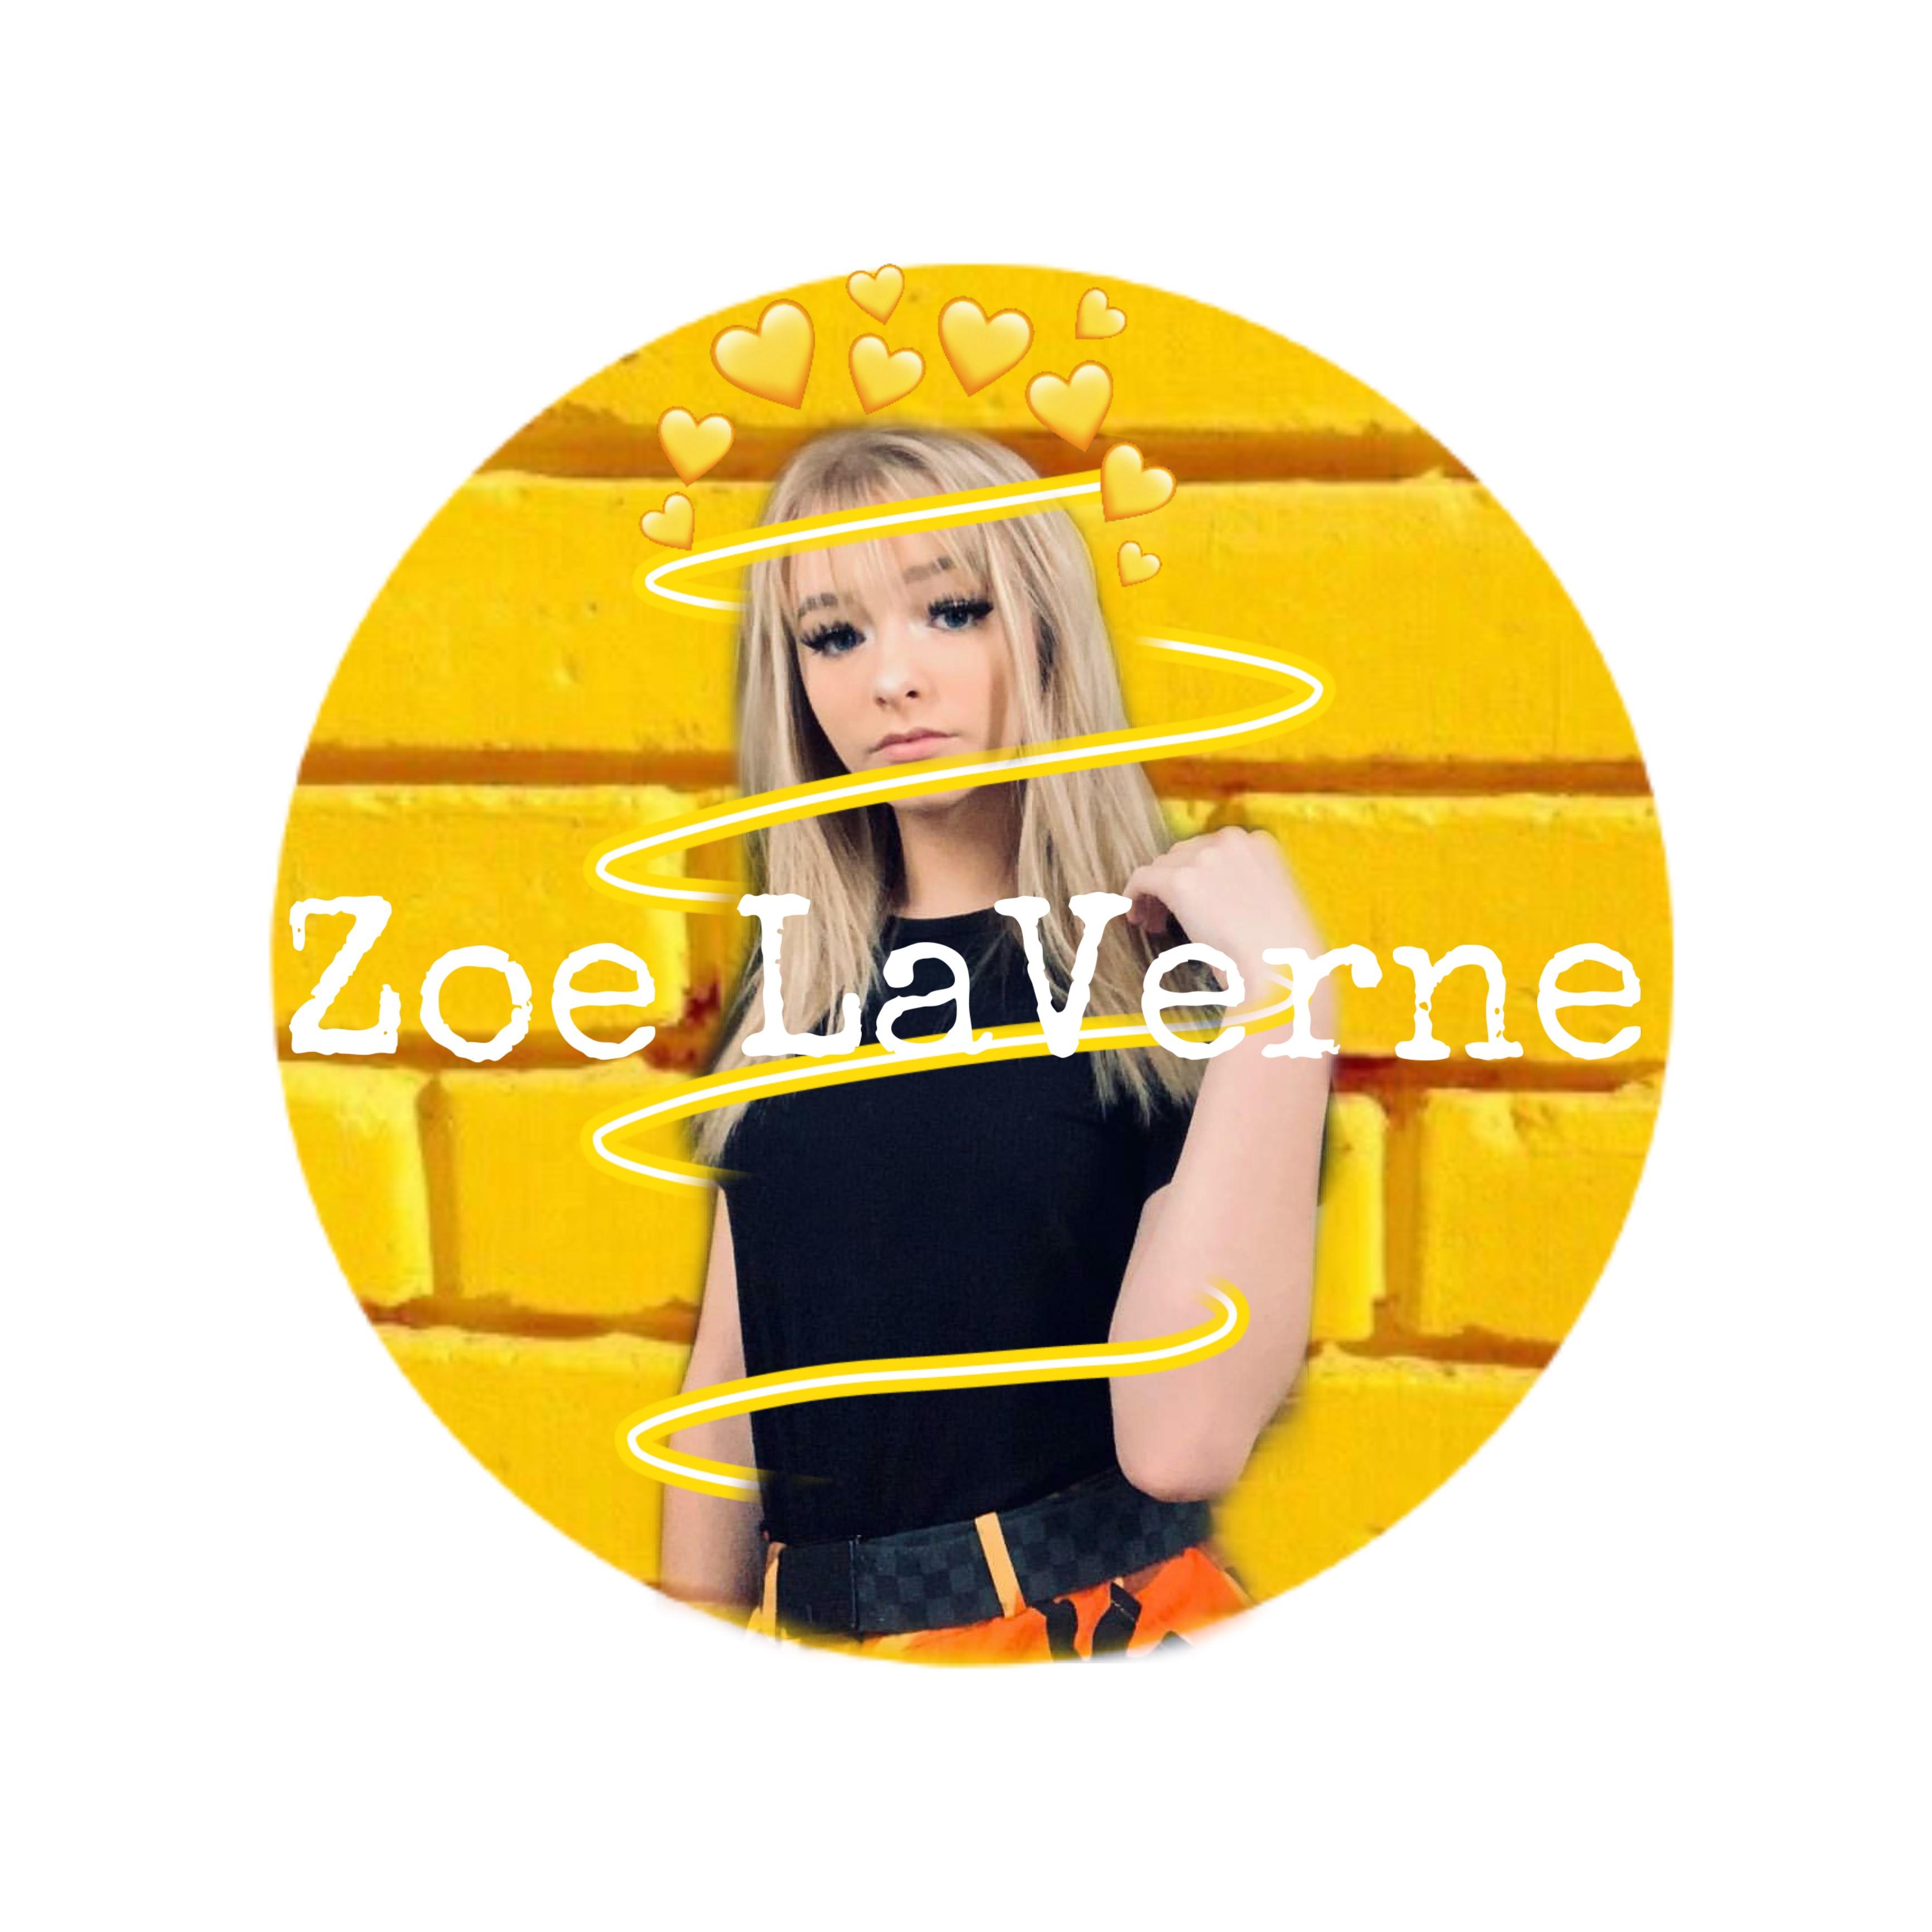 Freetoedit Zoelaverne Zoe Laverne Edit Editbyme